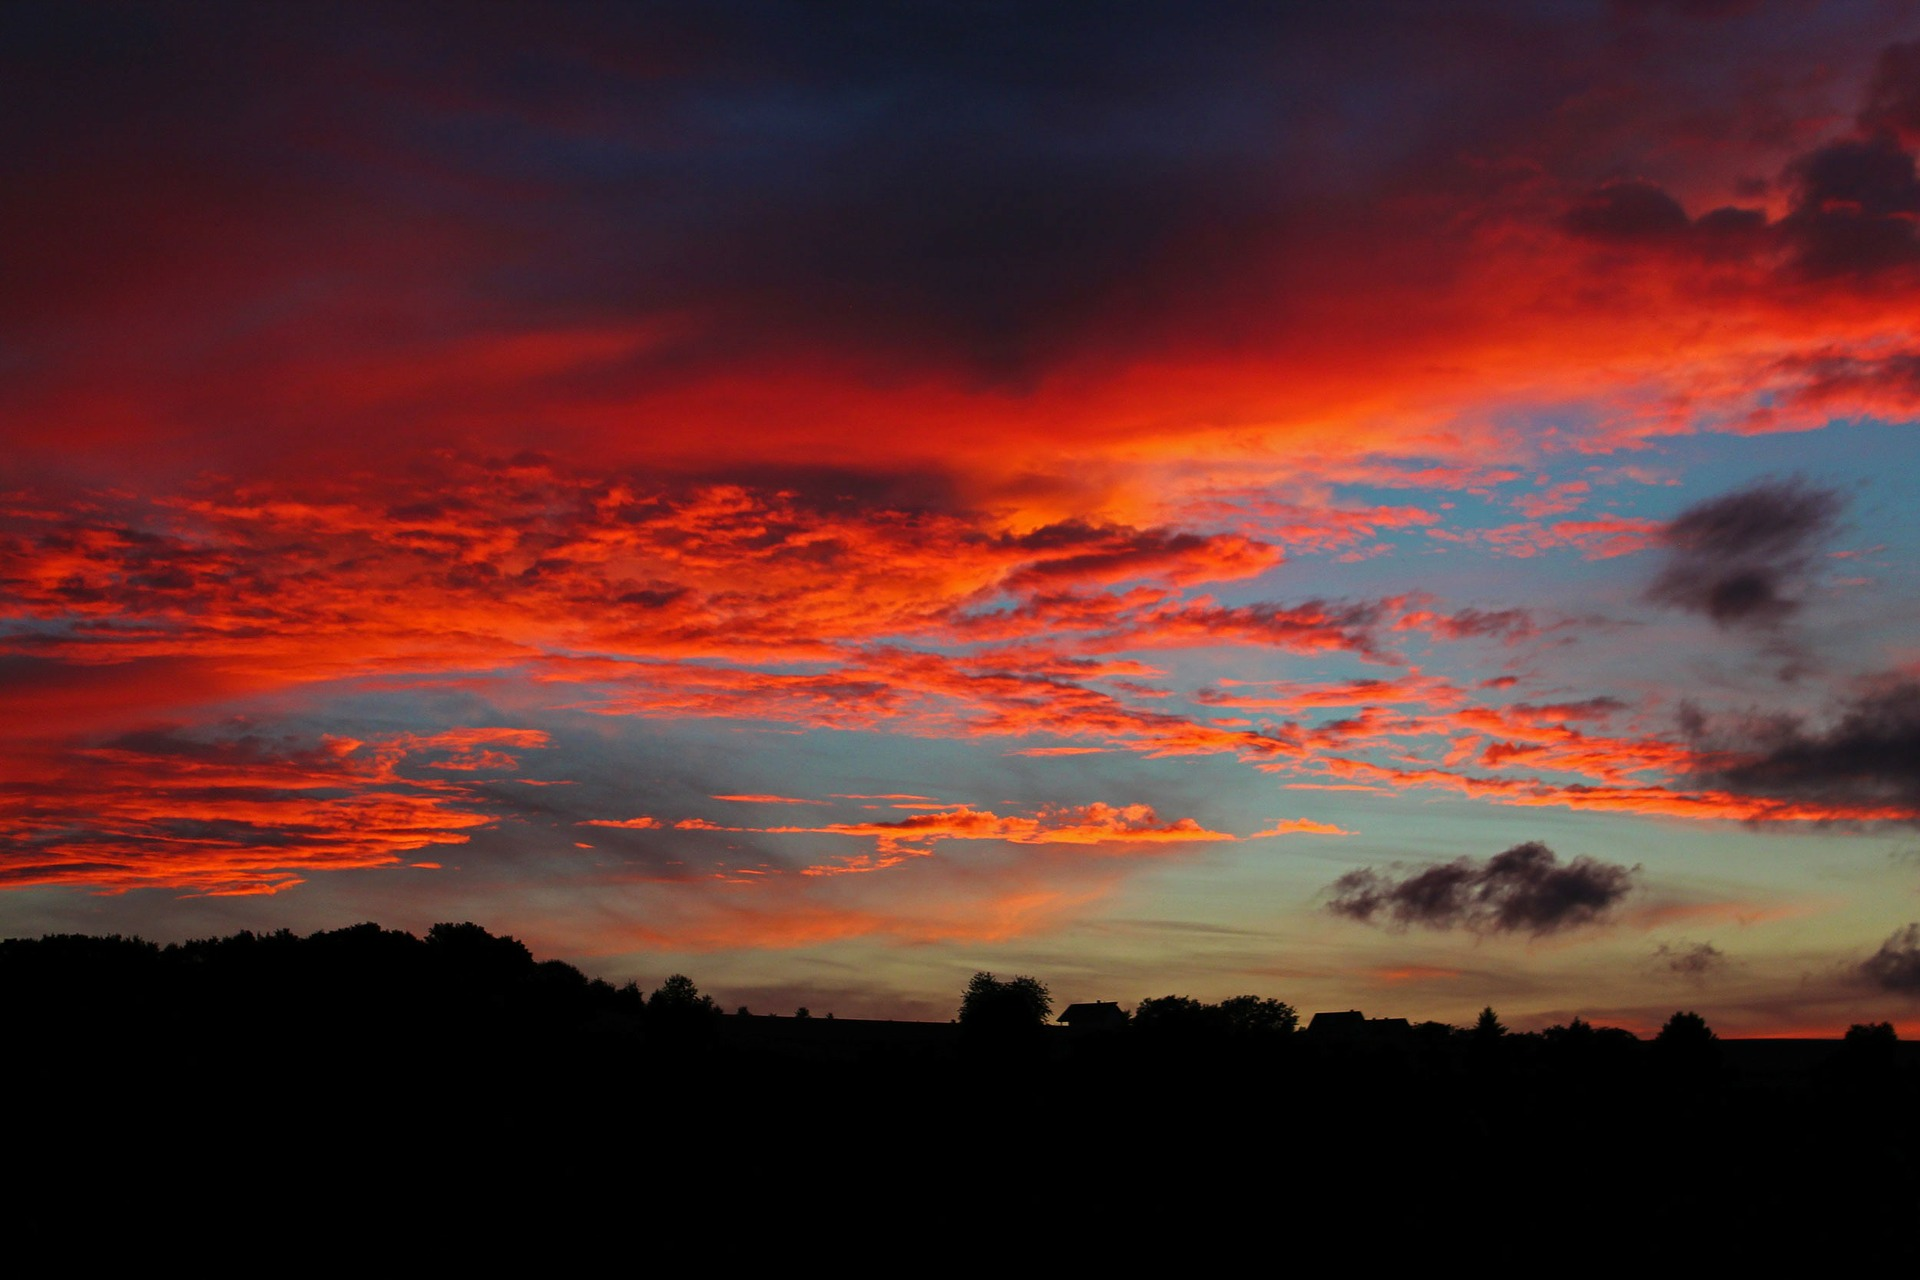 sunset-194702_1920